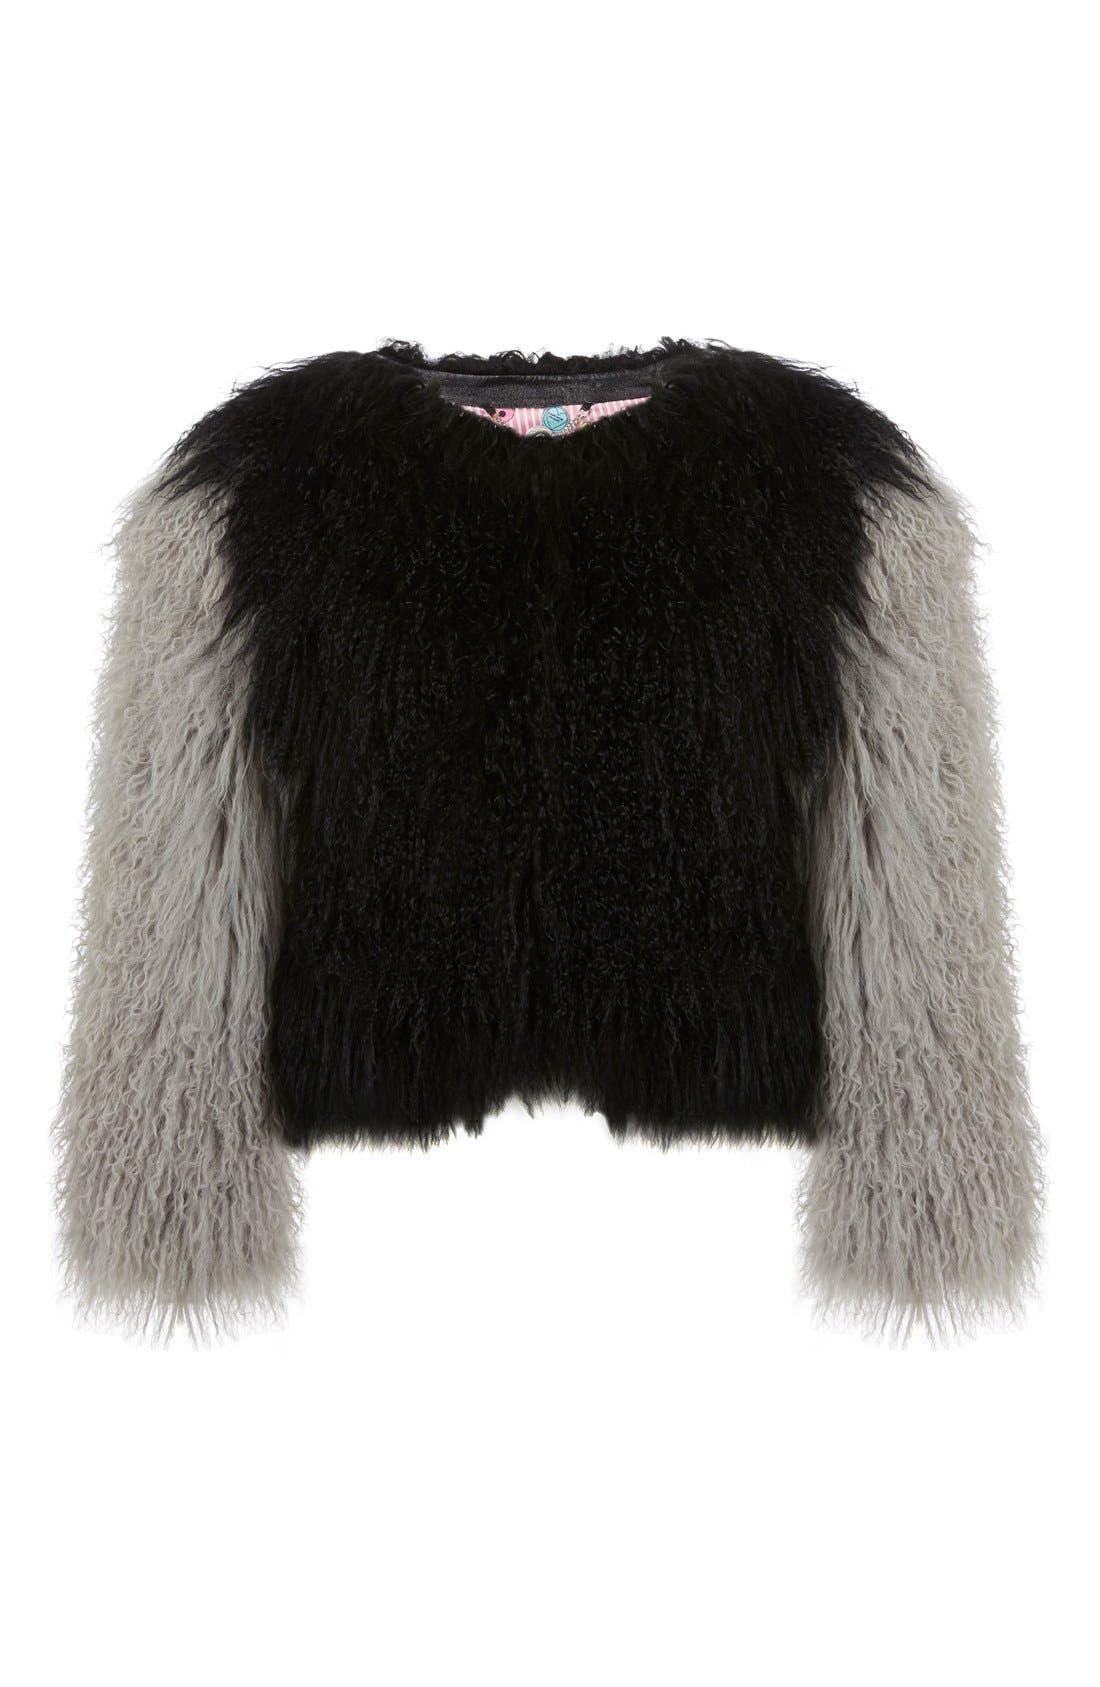 Main Image - Charlotte Simone 'Classic Fuzz' Genuine Mongolian Lamb Fur Bolero